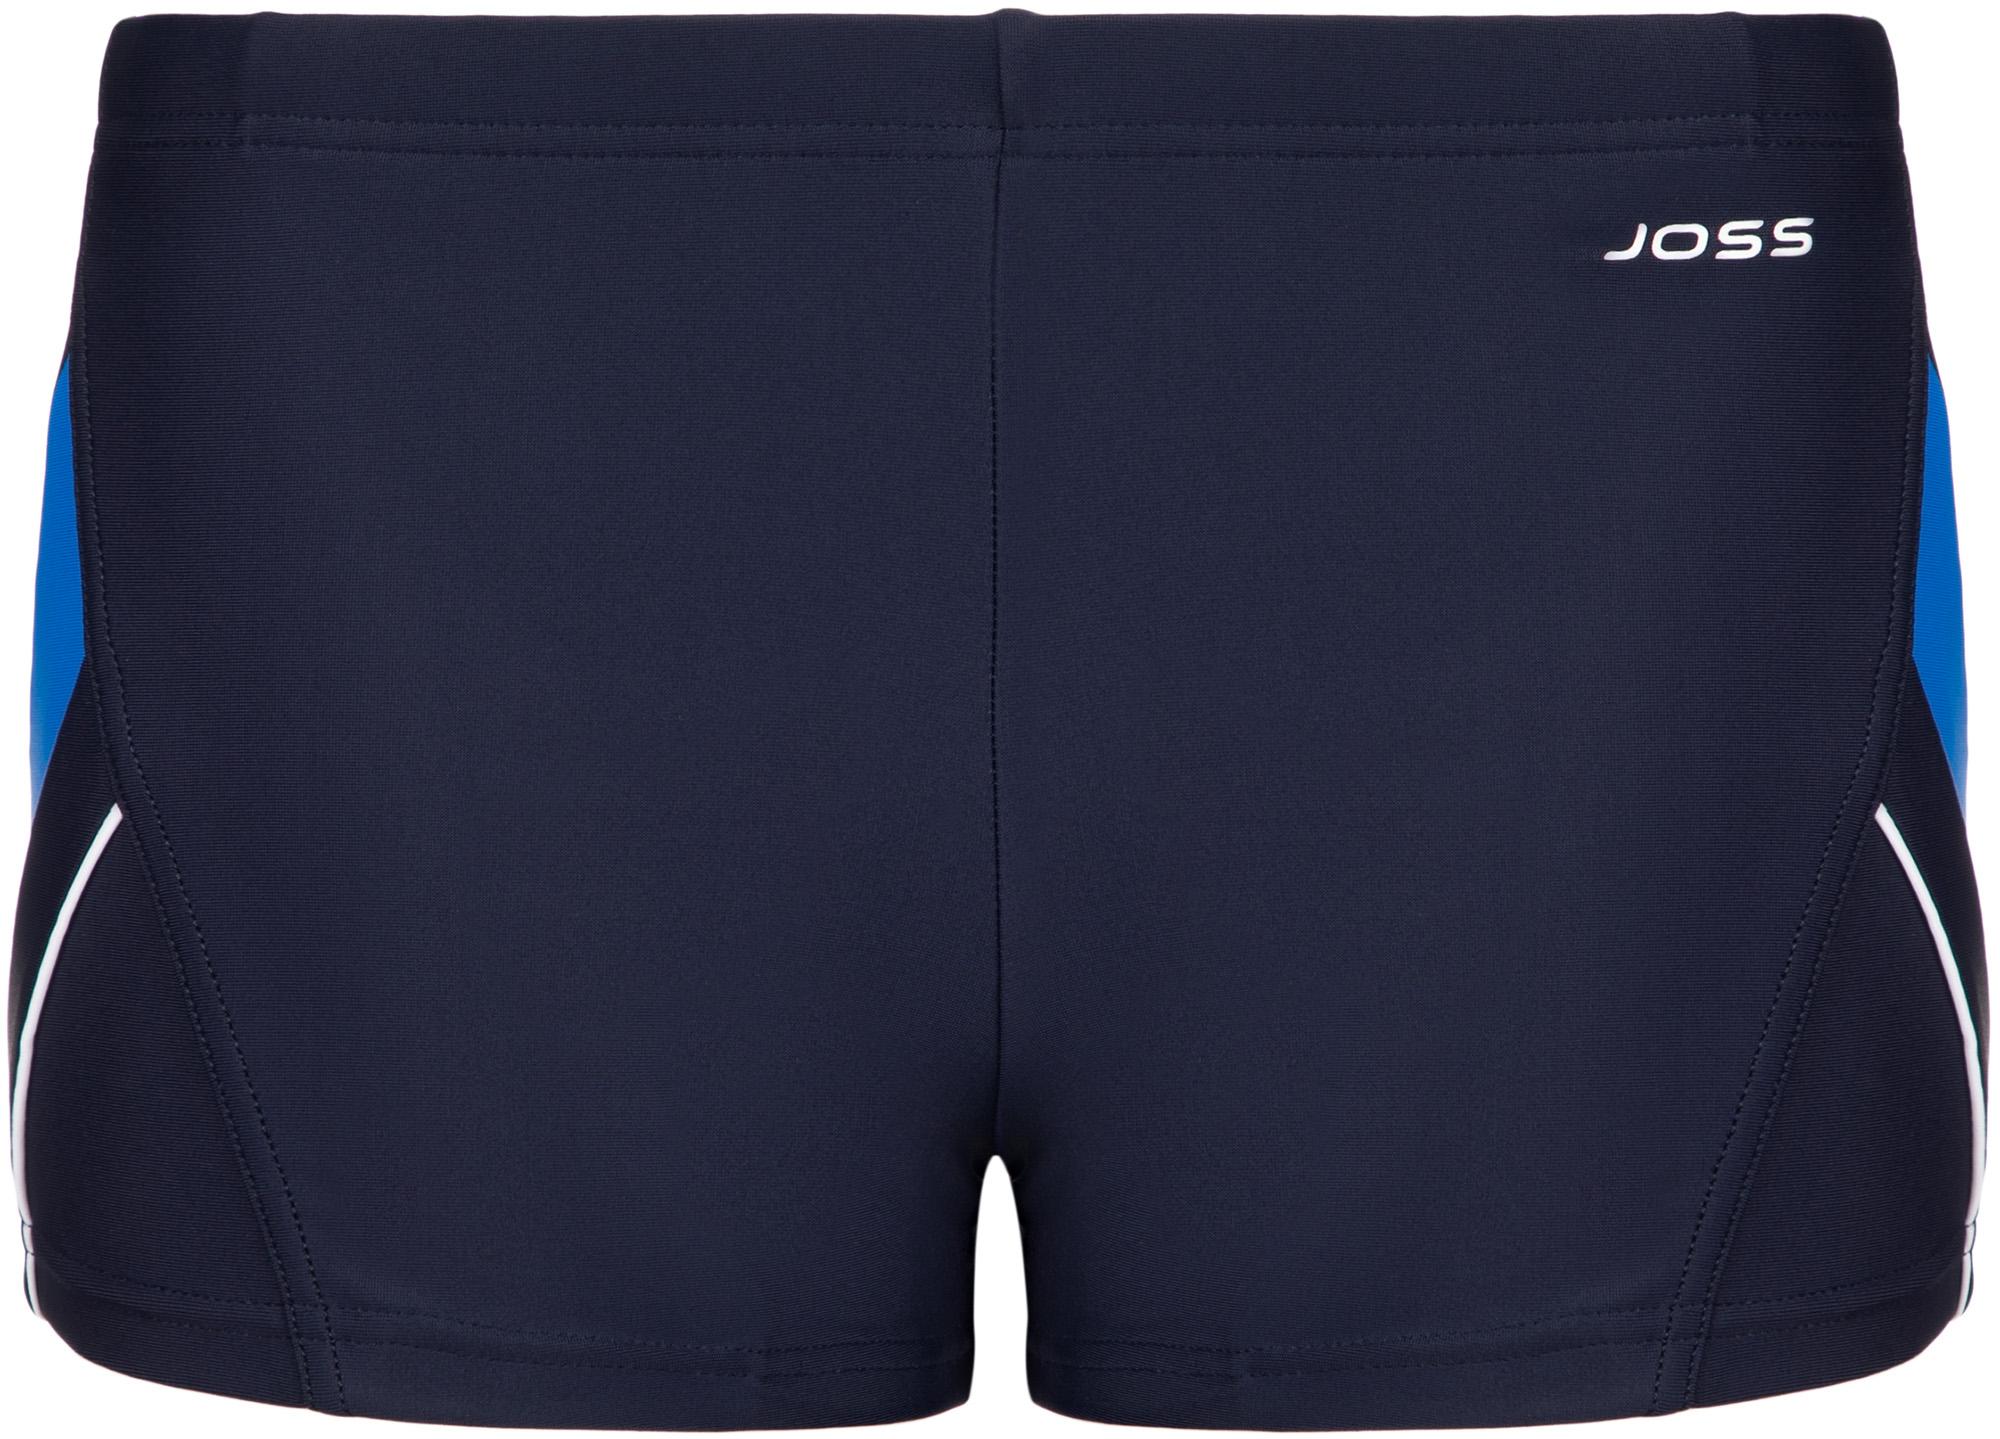 Joss Плавки-шорты для мальчиков Joss, размер 164 joss плавки для мальчиков joss размер 128